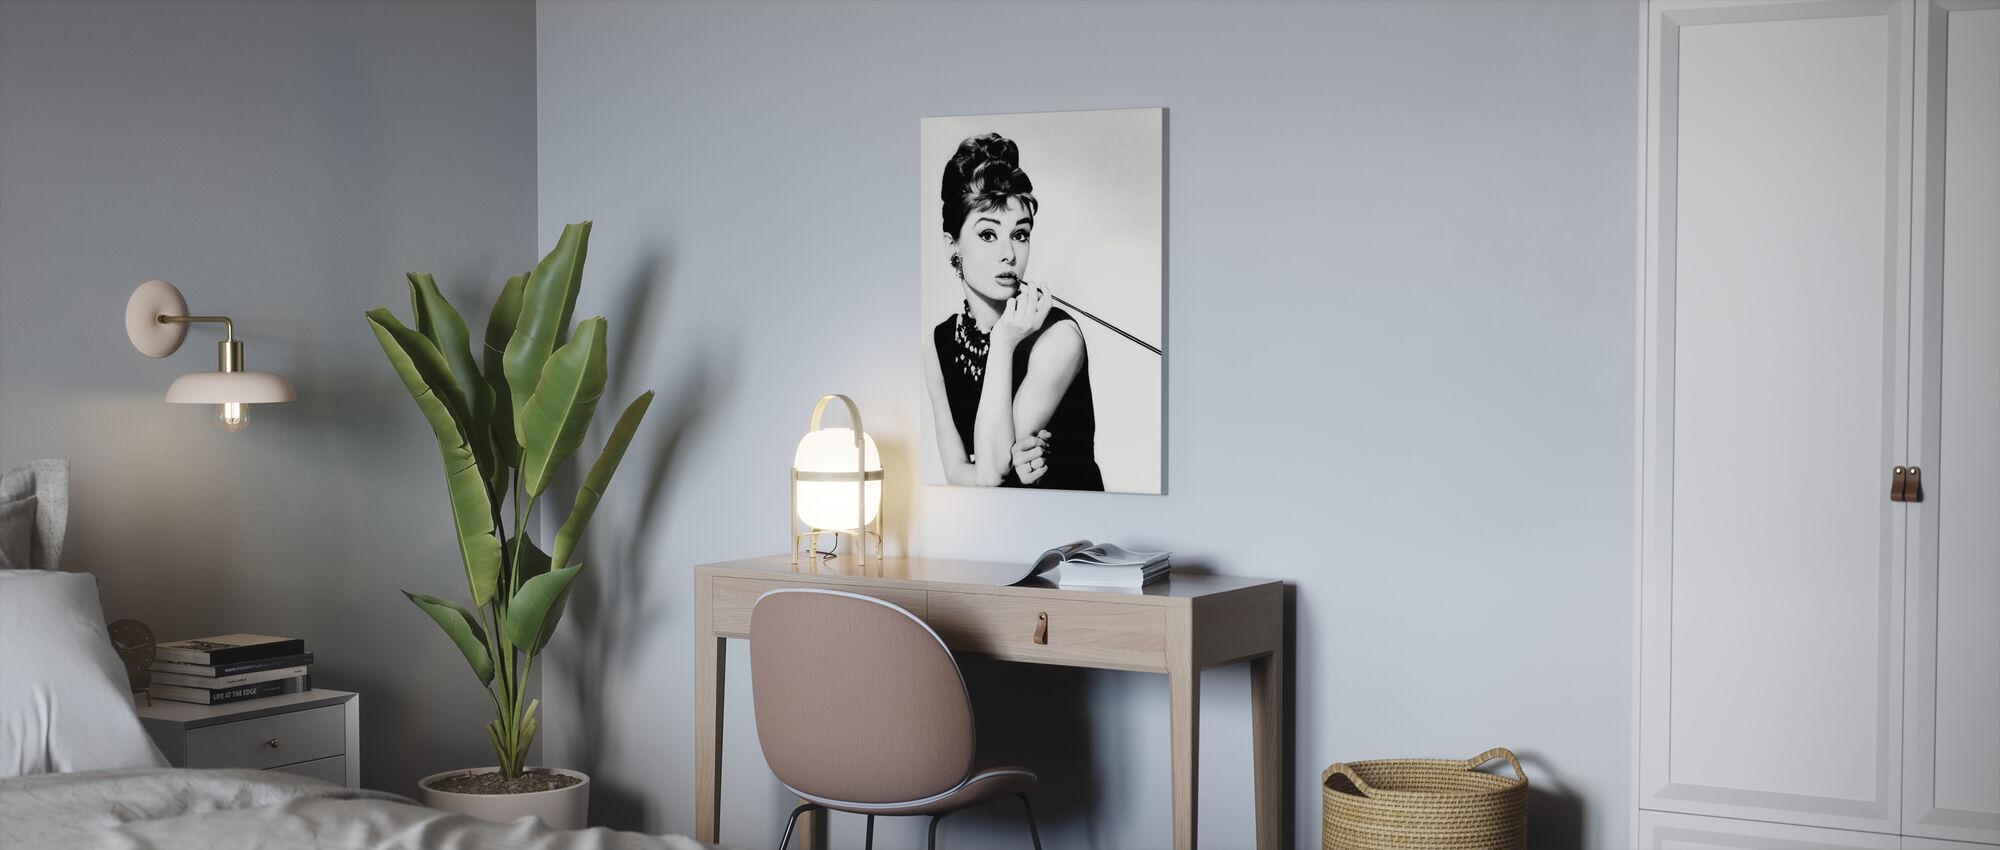 Audrey Hepburn in Breakfast at Tiffanys - Canvas print - Office